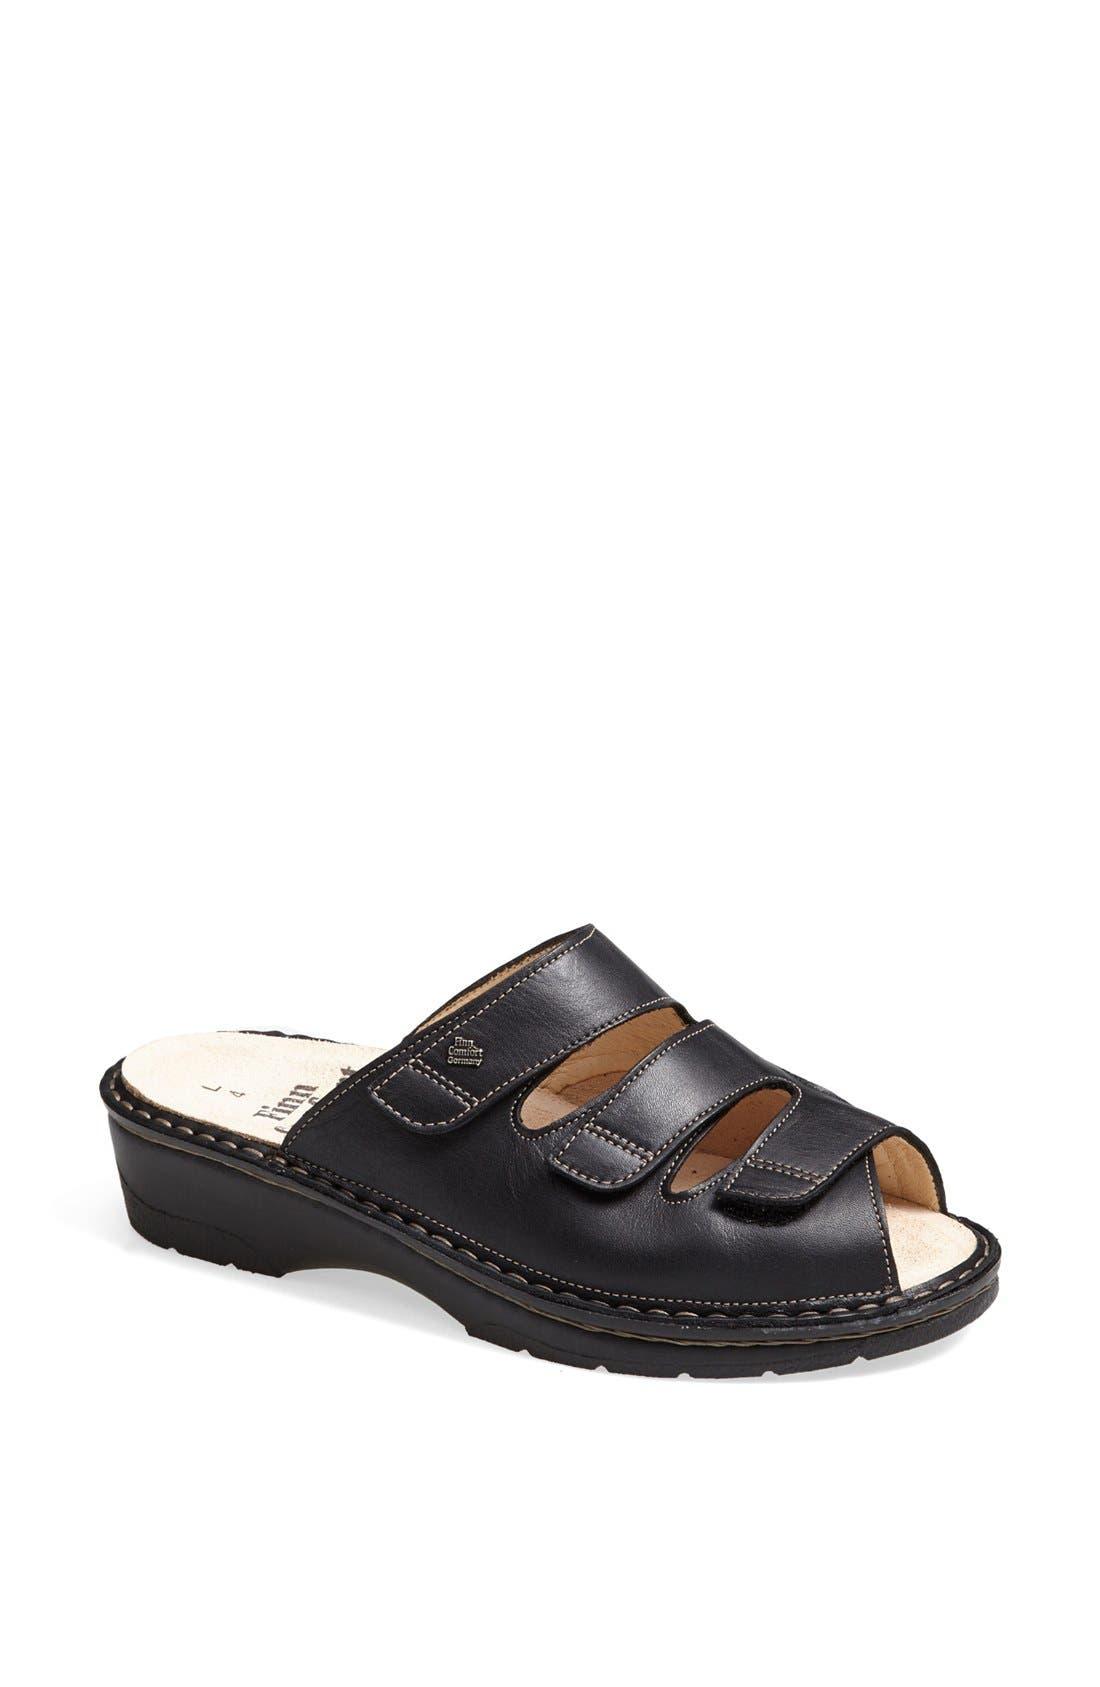 'Tilburg' Leather Sandal,                             Main thumbnail 1, color,                             001